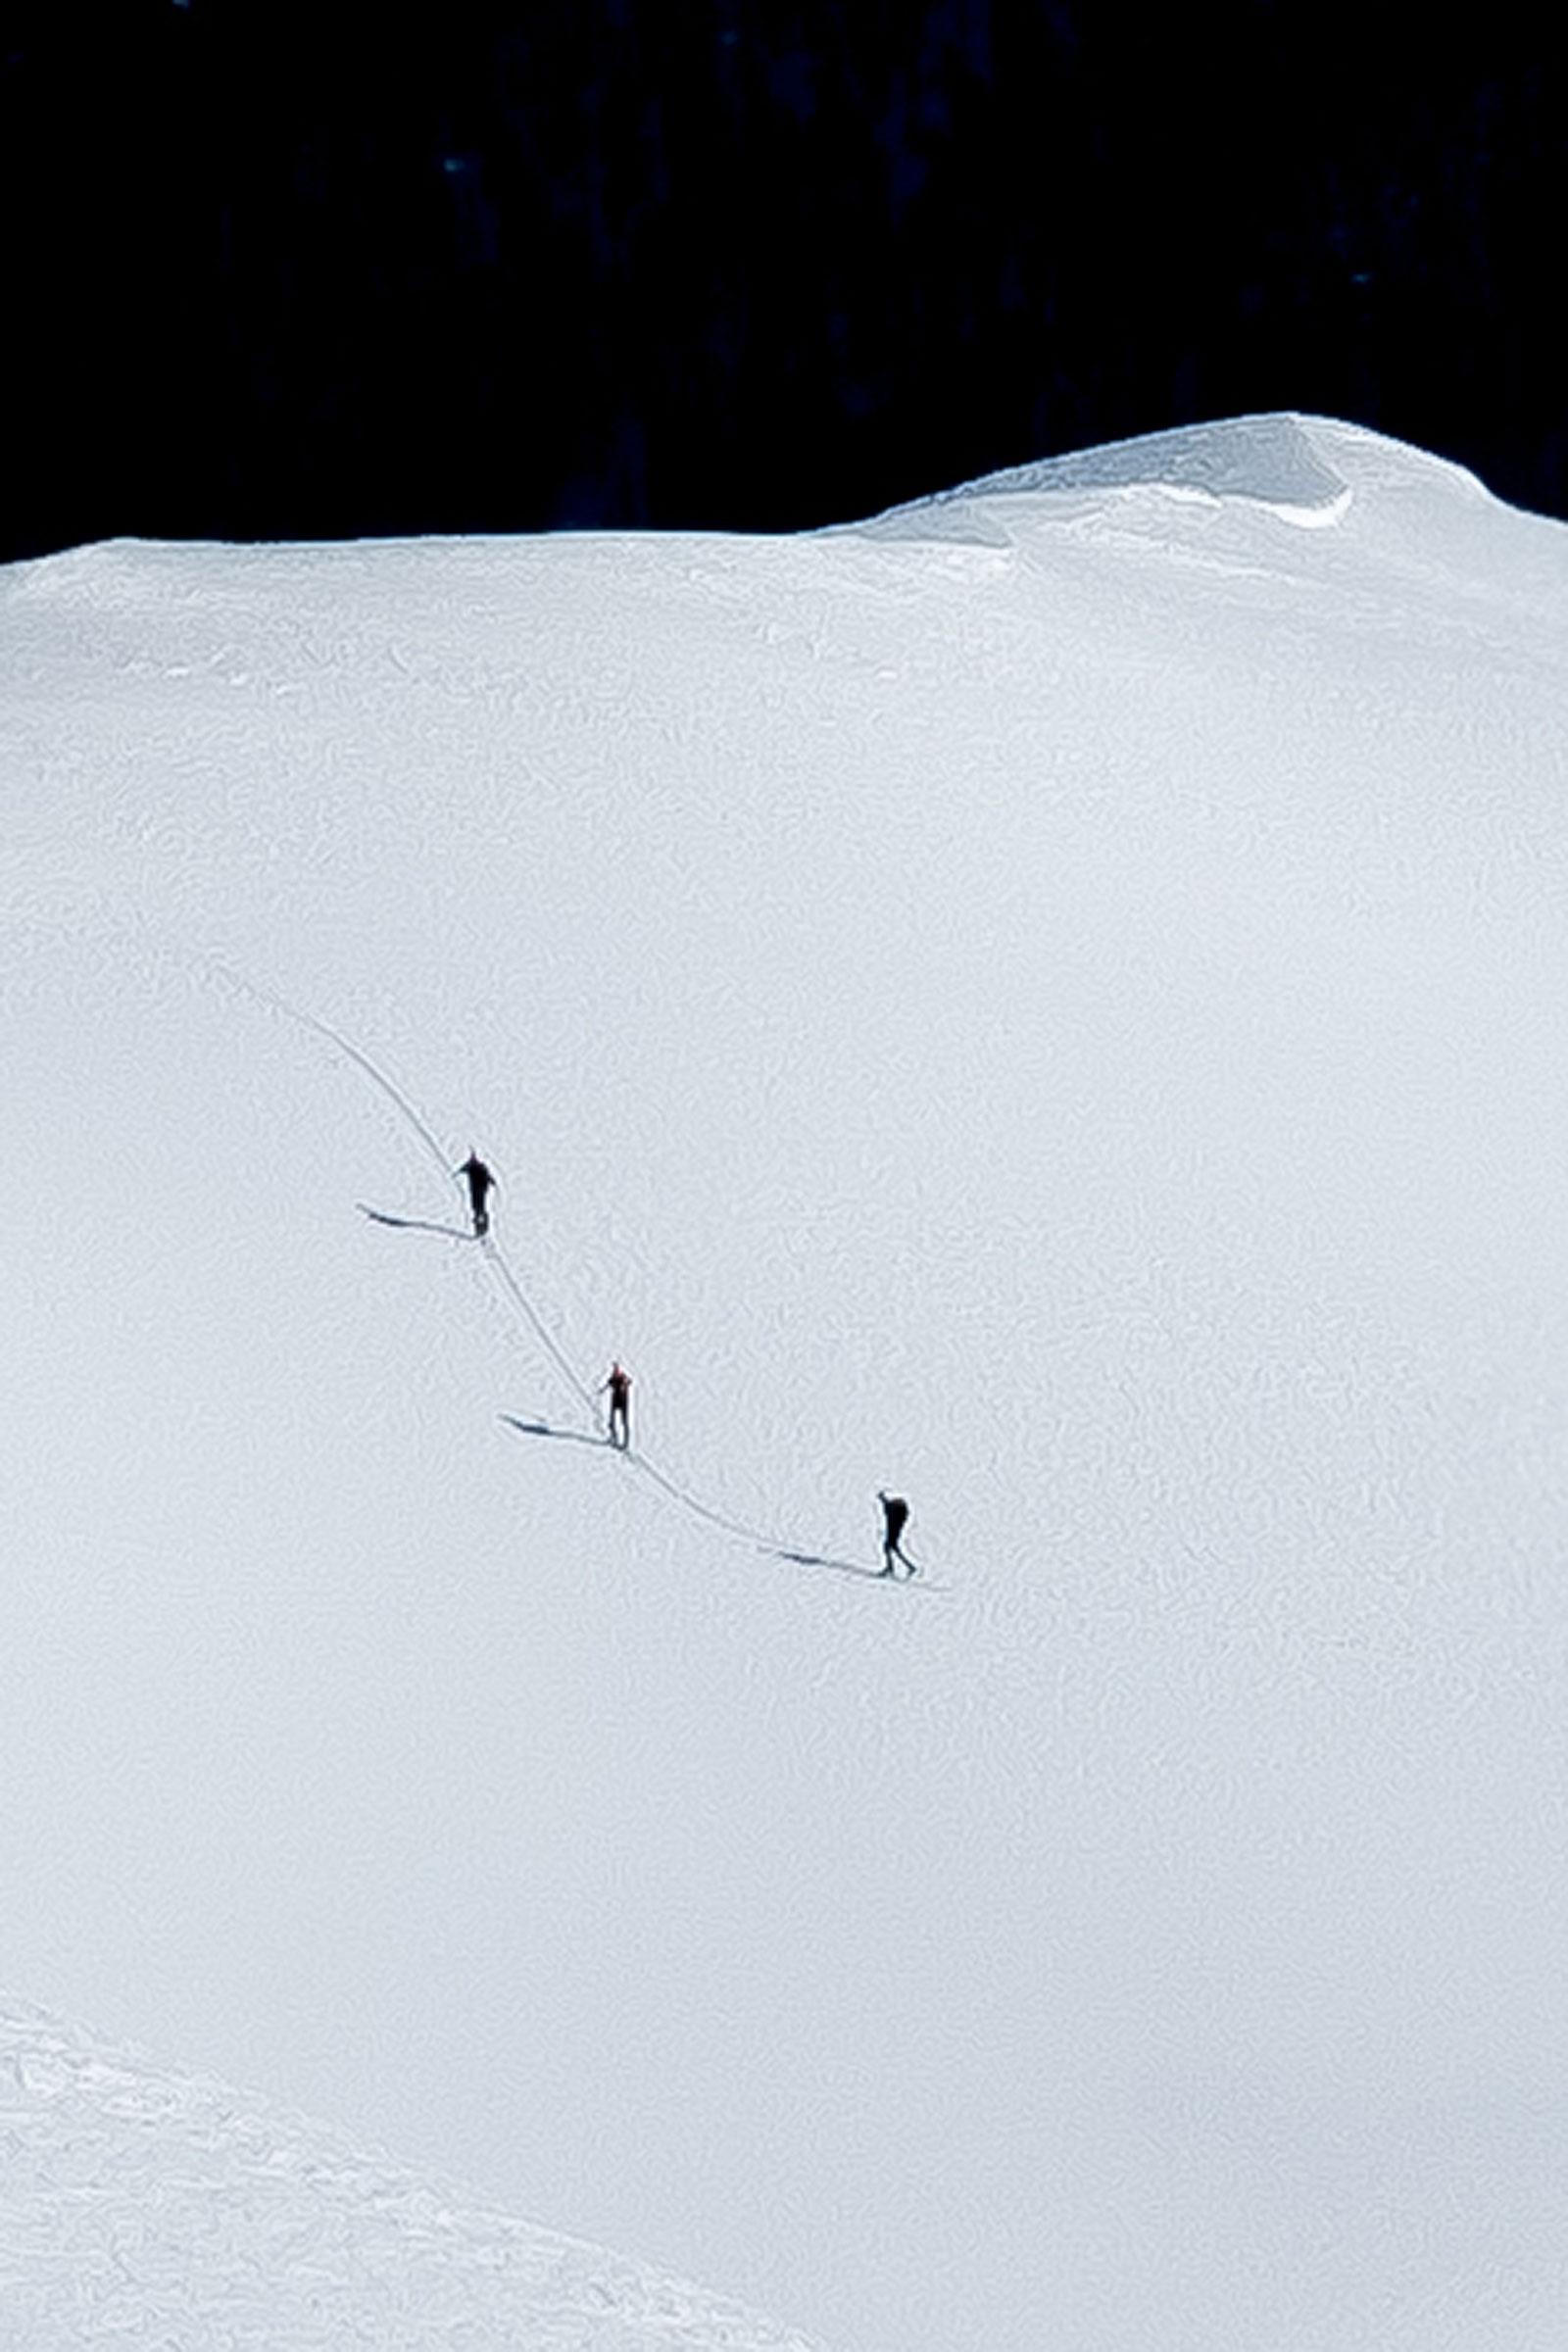 Drei. Skitour in Südtirol | Pauli Trenkwalder, Berge & Psychologie